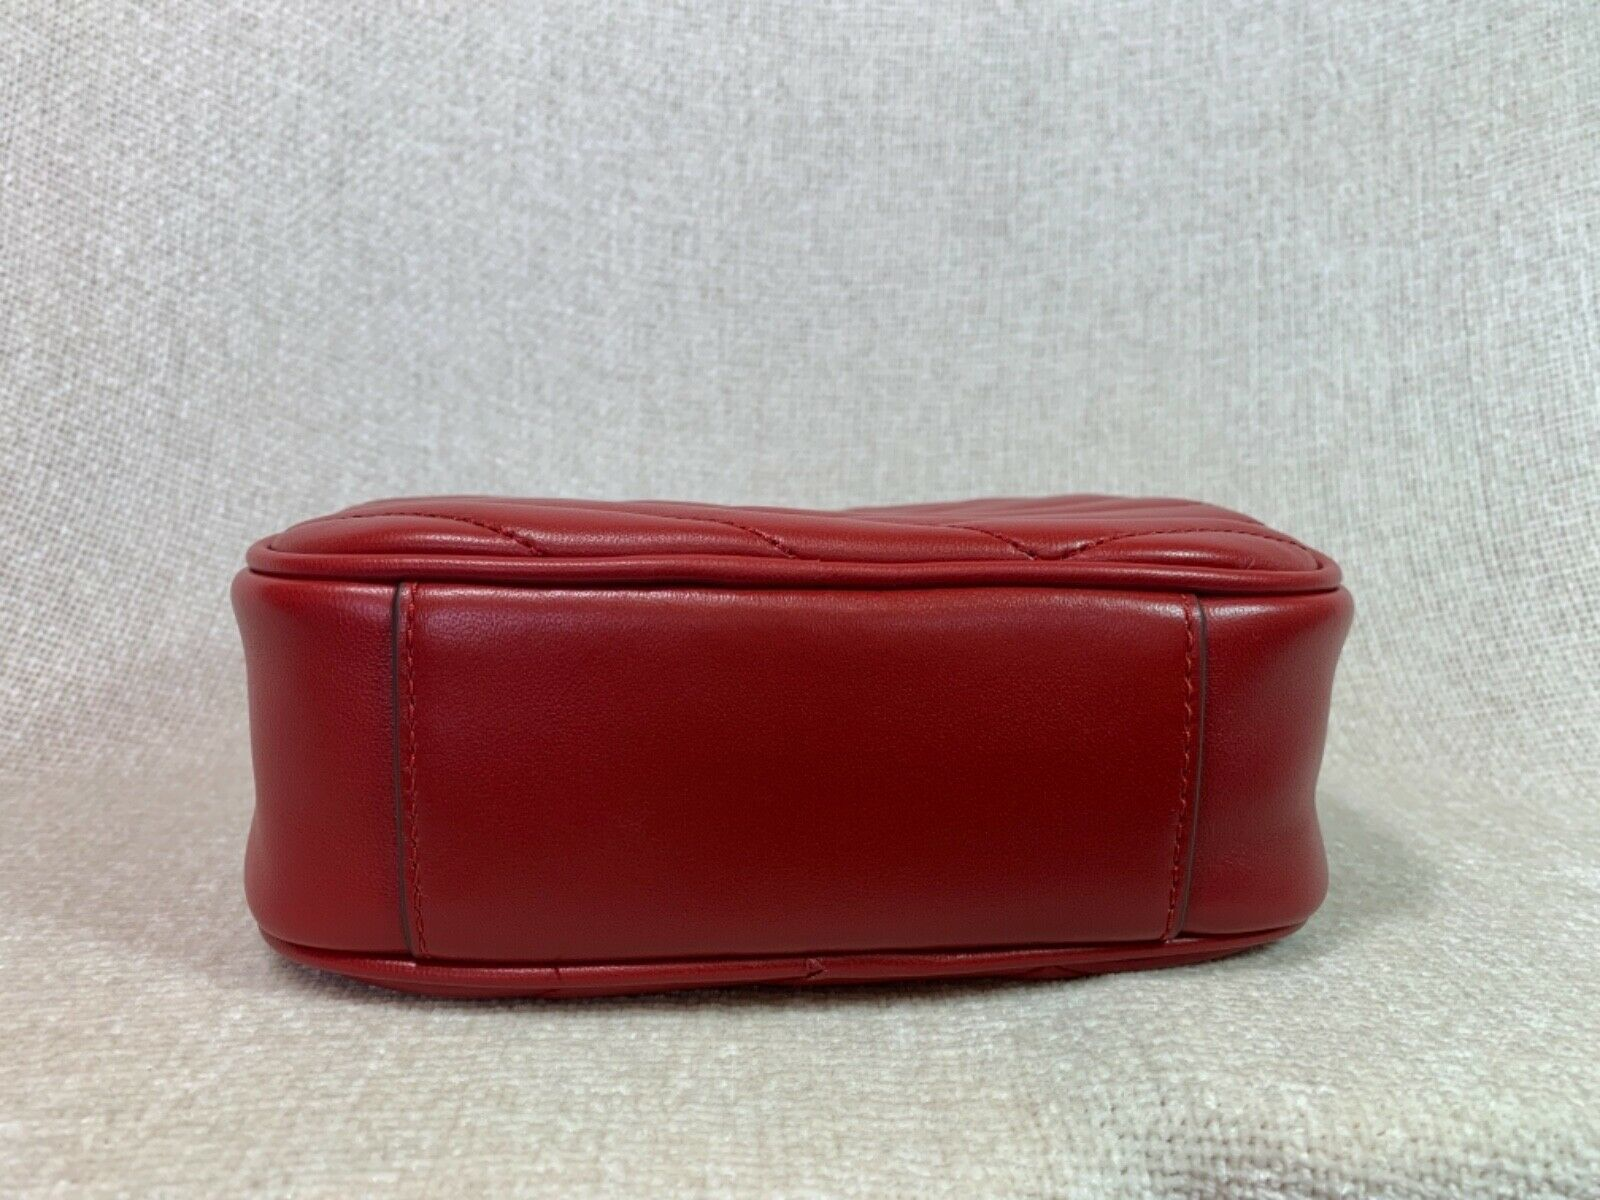 NWT Tory Burch Red Apple Kira Chevron Small Camera Bag $358 image 10